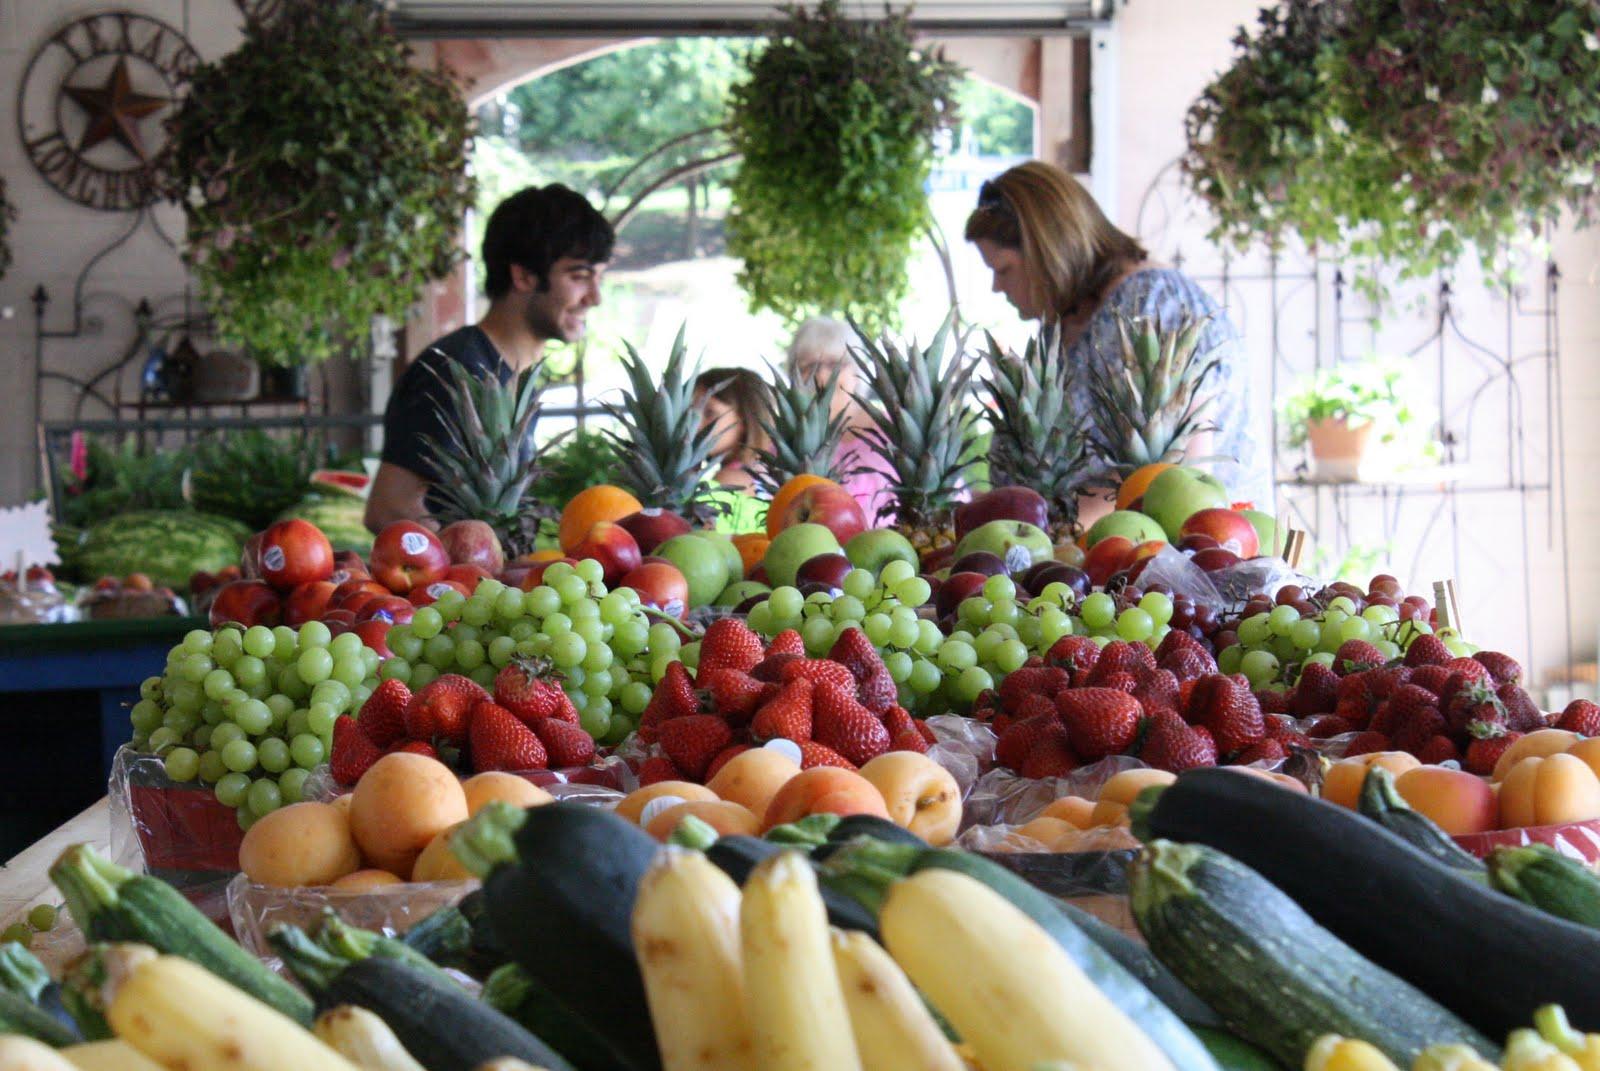 Farmer's Market - Slater Farms